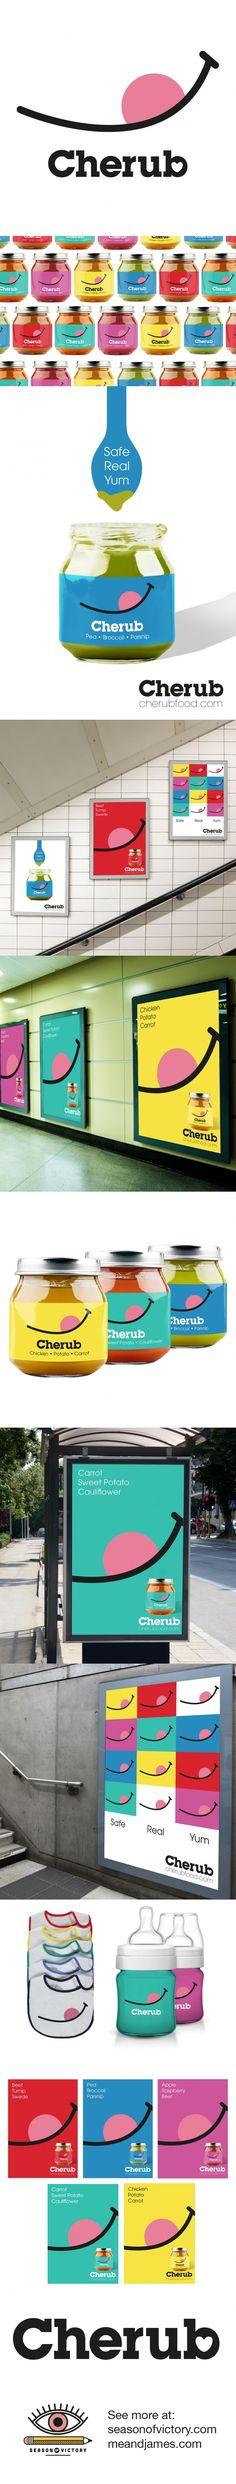 Cherub Baby Food - Packaging, Branding, Advertisment & Logo. Working with meandjames.com, we created the logo, branding, packaging design and advertisment campaign for the brand. #logo #design #graphicdesign #artdirection #packaging #foodpackaging #colorfulpackaging #babyfood #babyfoodpackaging #logodesign #advertising #ad #addesign #poster #posterdesign #branding #artdirector #graphicdesigner #behance #portfolio